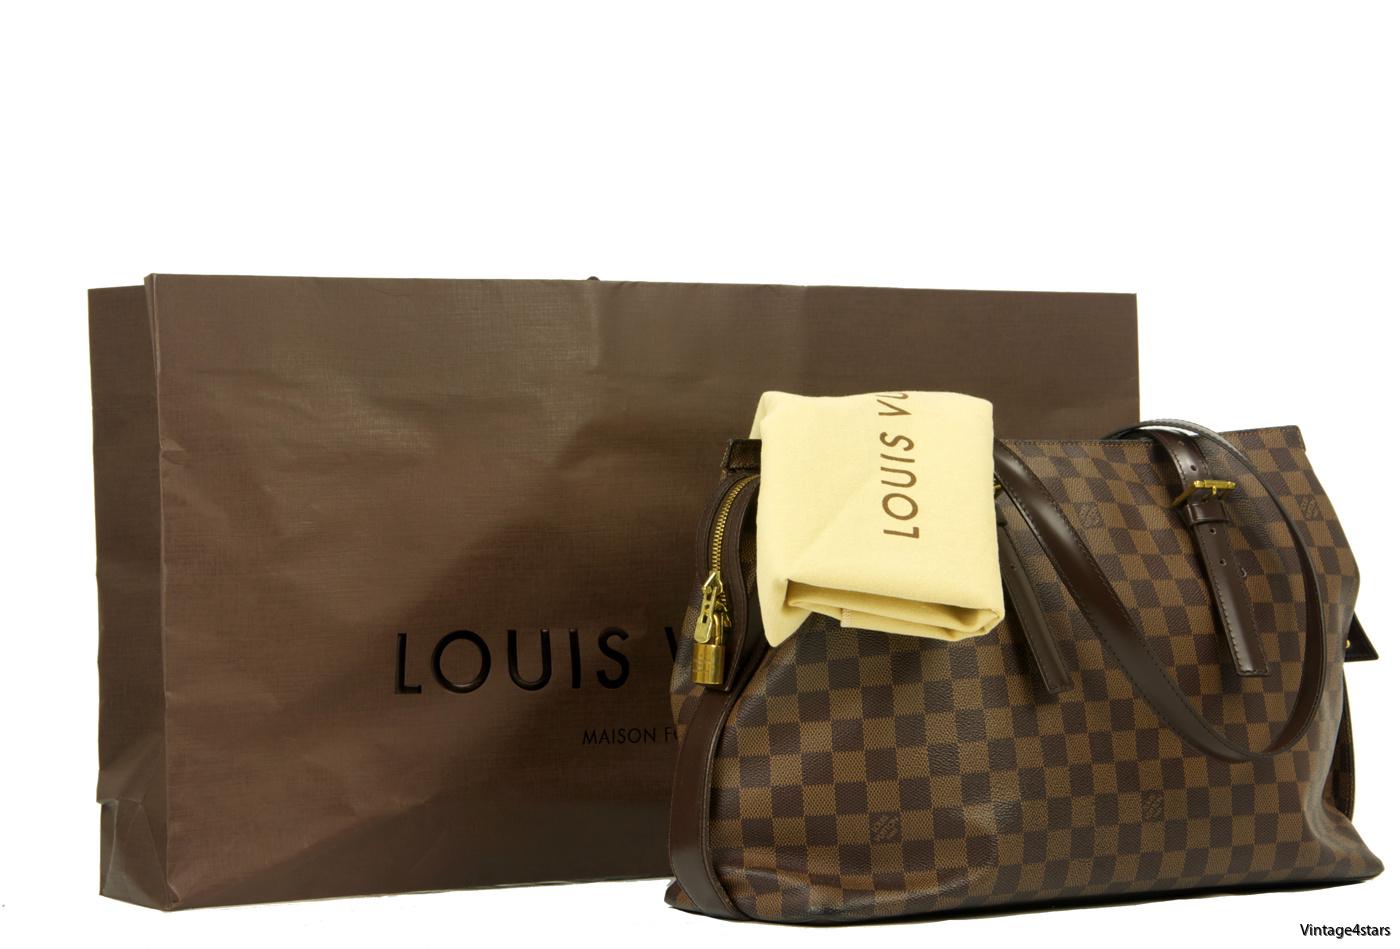 Louis Vuitton Chelsea Damier Ebene 23